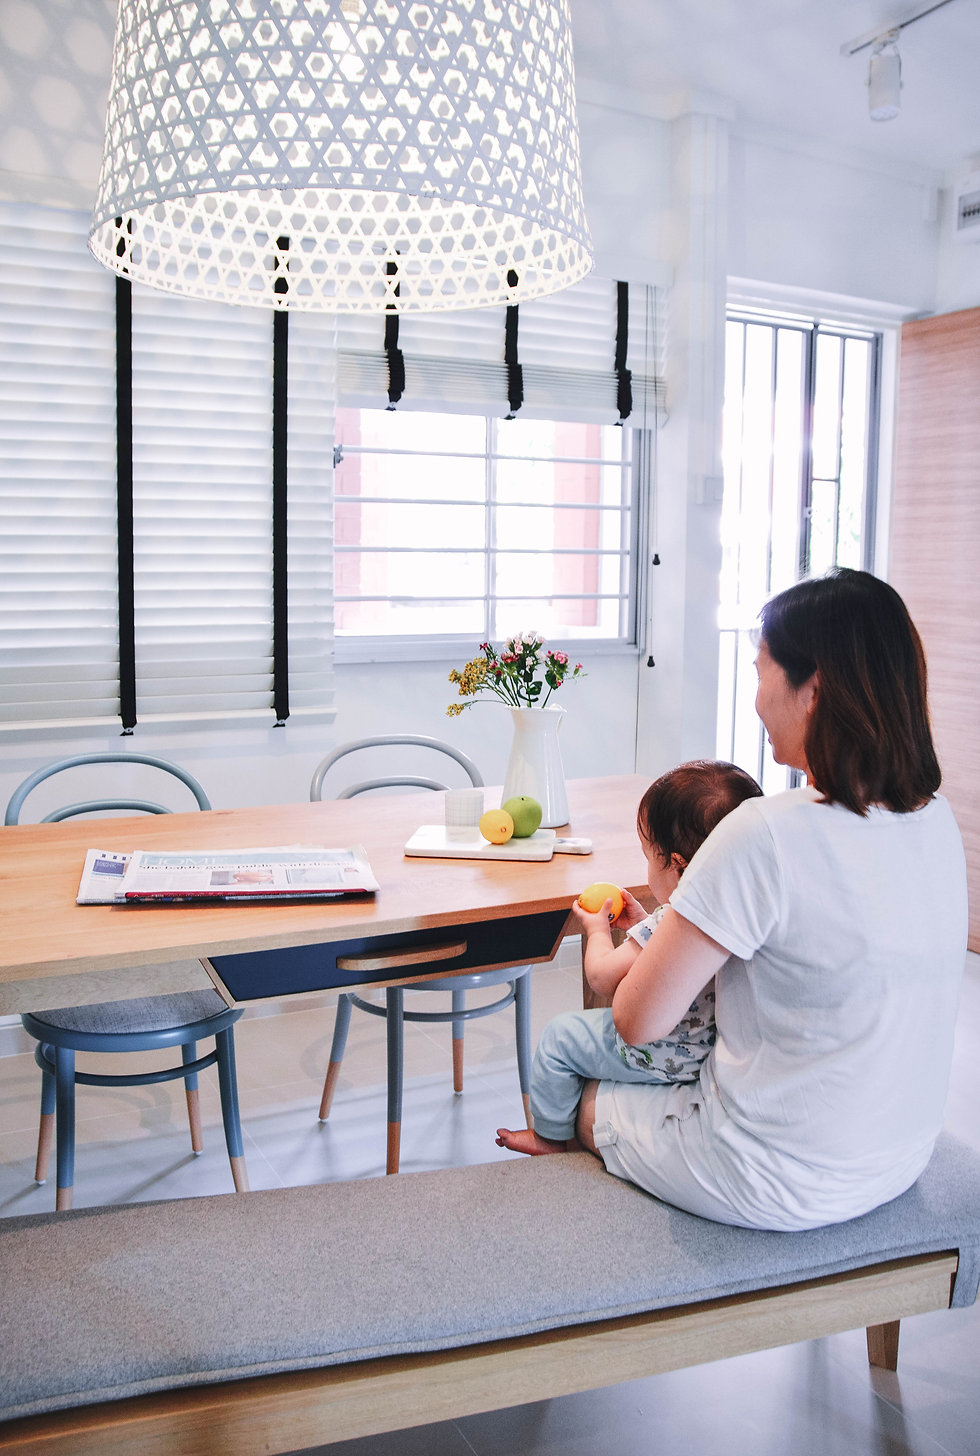 A Cozy Respite for the Modern Family